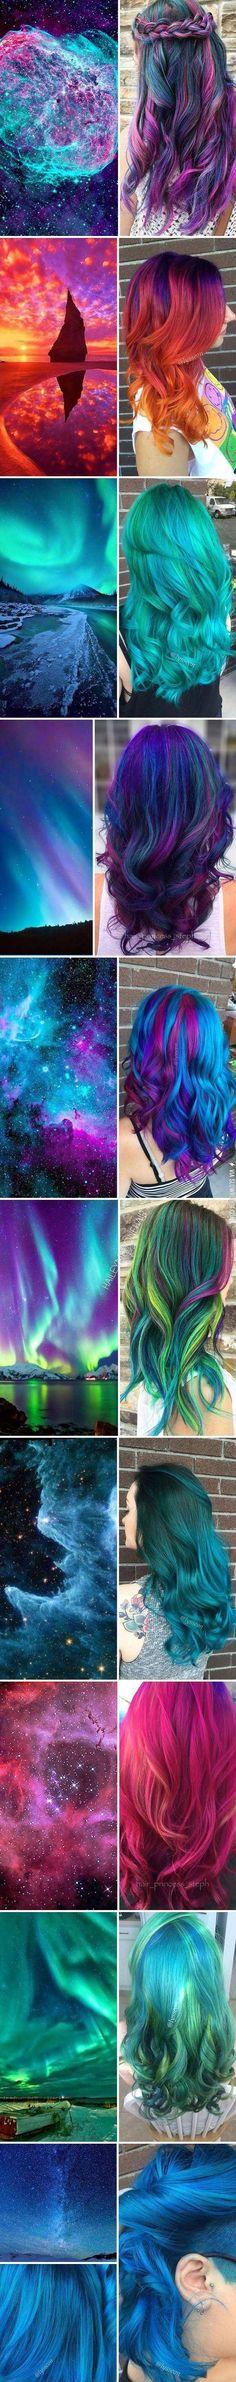 This 'Galaxy Hair' trend is spectacular: http://slowrobot.com/i/76701?utm_content=buffer327dc&utm_medium=social&utm_source=pinterest.com&utm_campaign=buffer